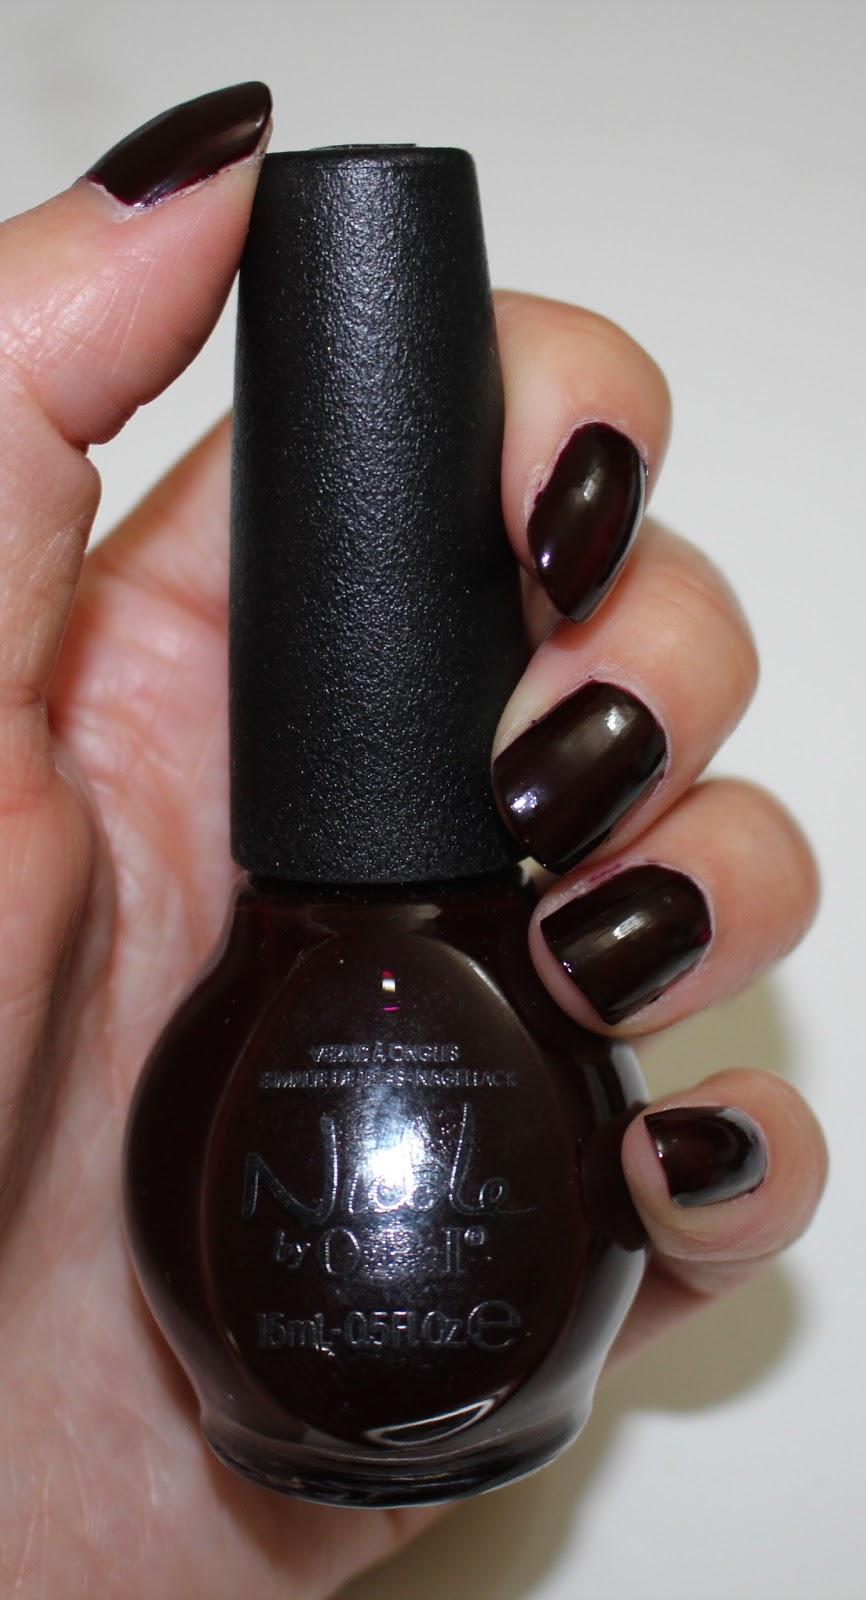 Nails: Nicole by O.P.I \